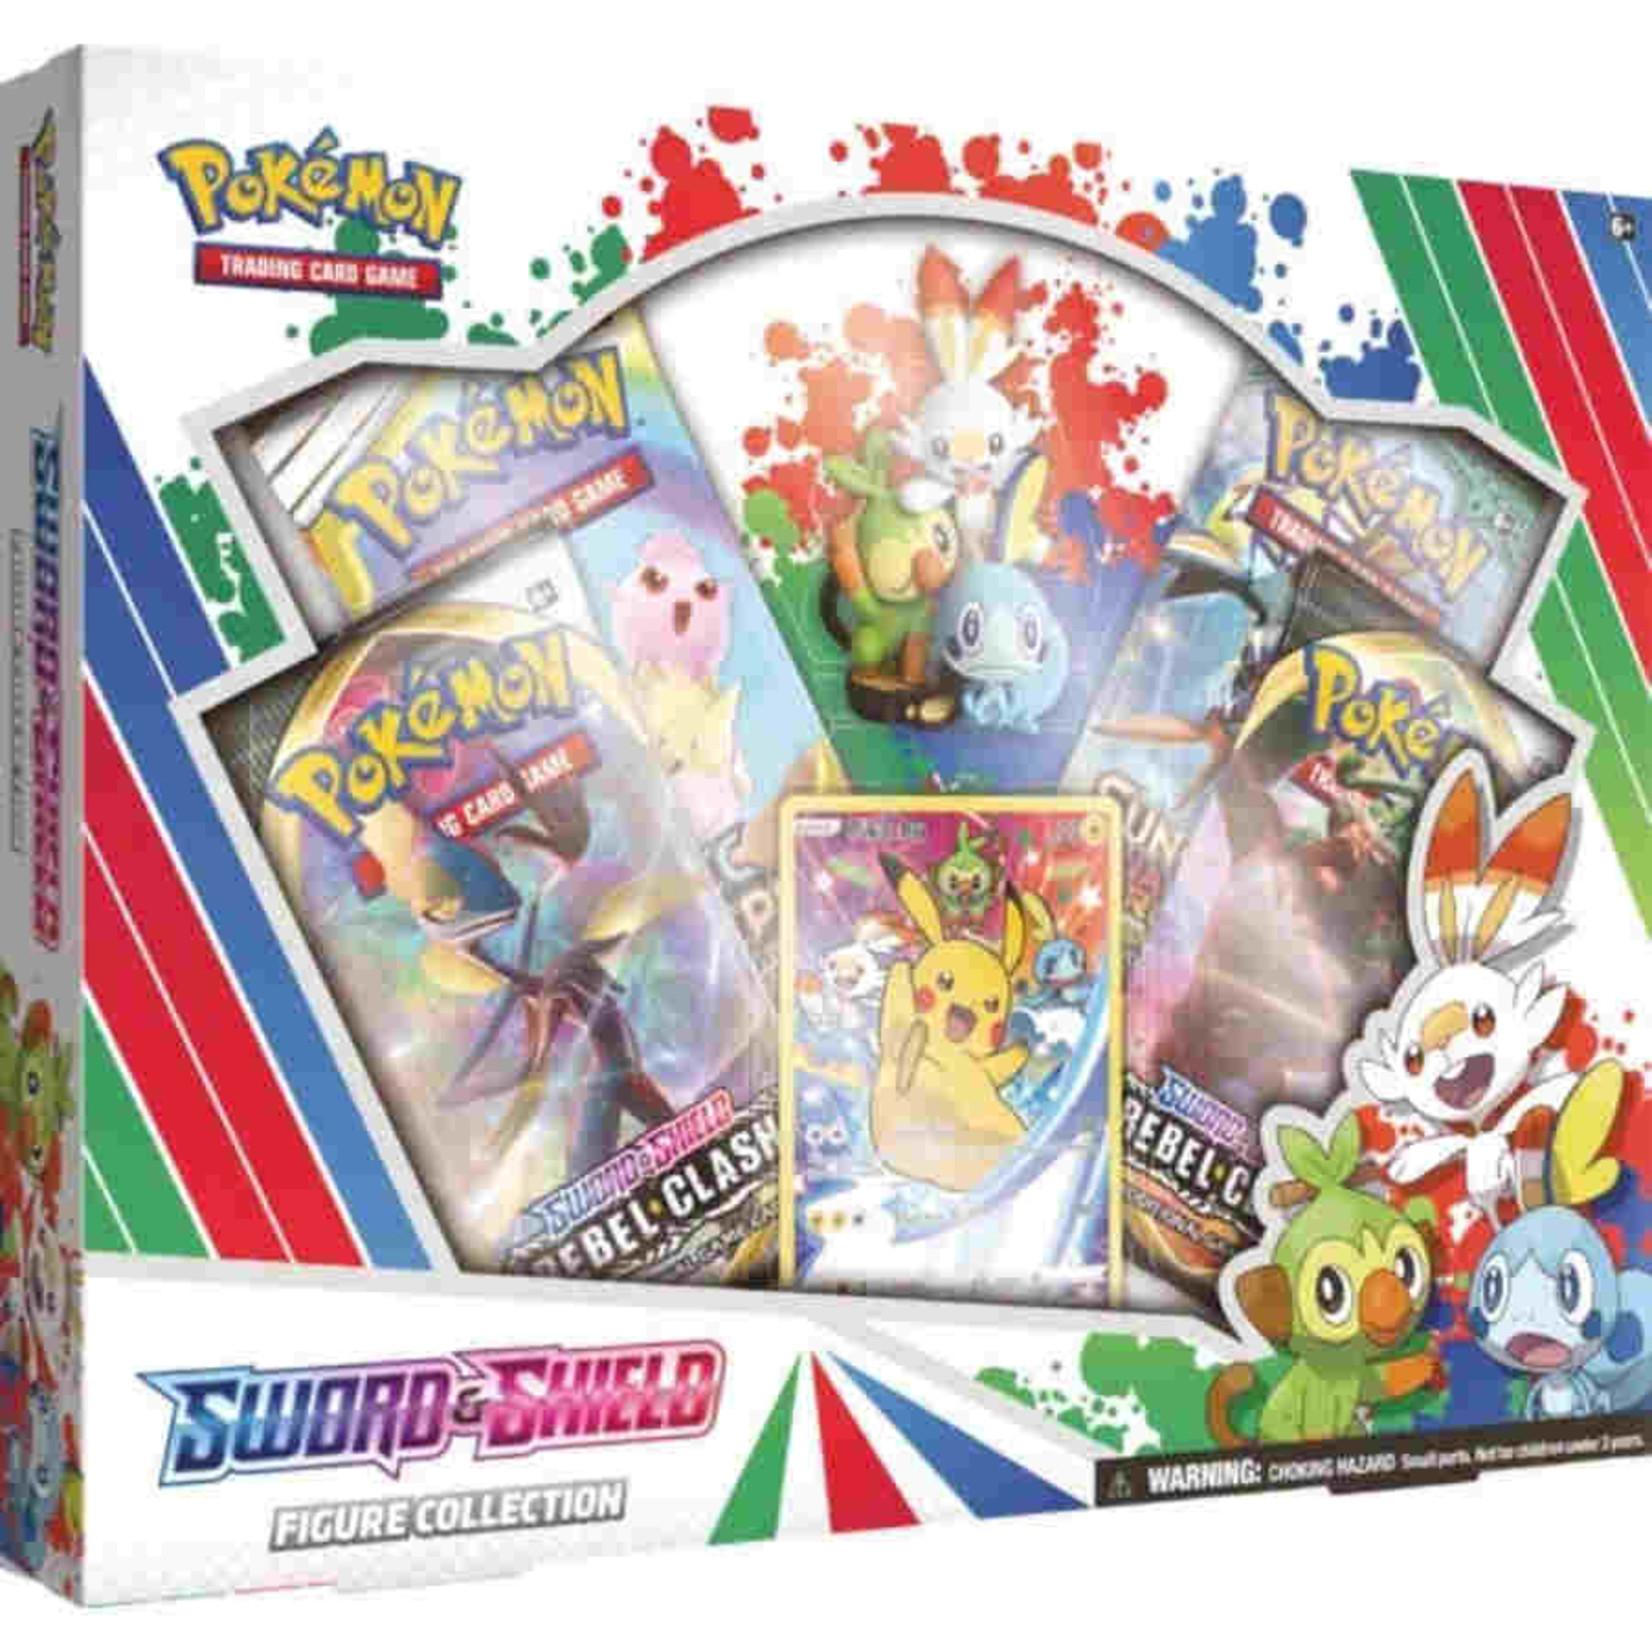 Pokemon International Pokemon Trading Card Game: Sword & Shield Figure Collection